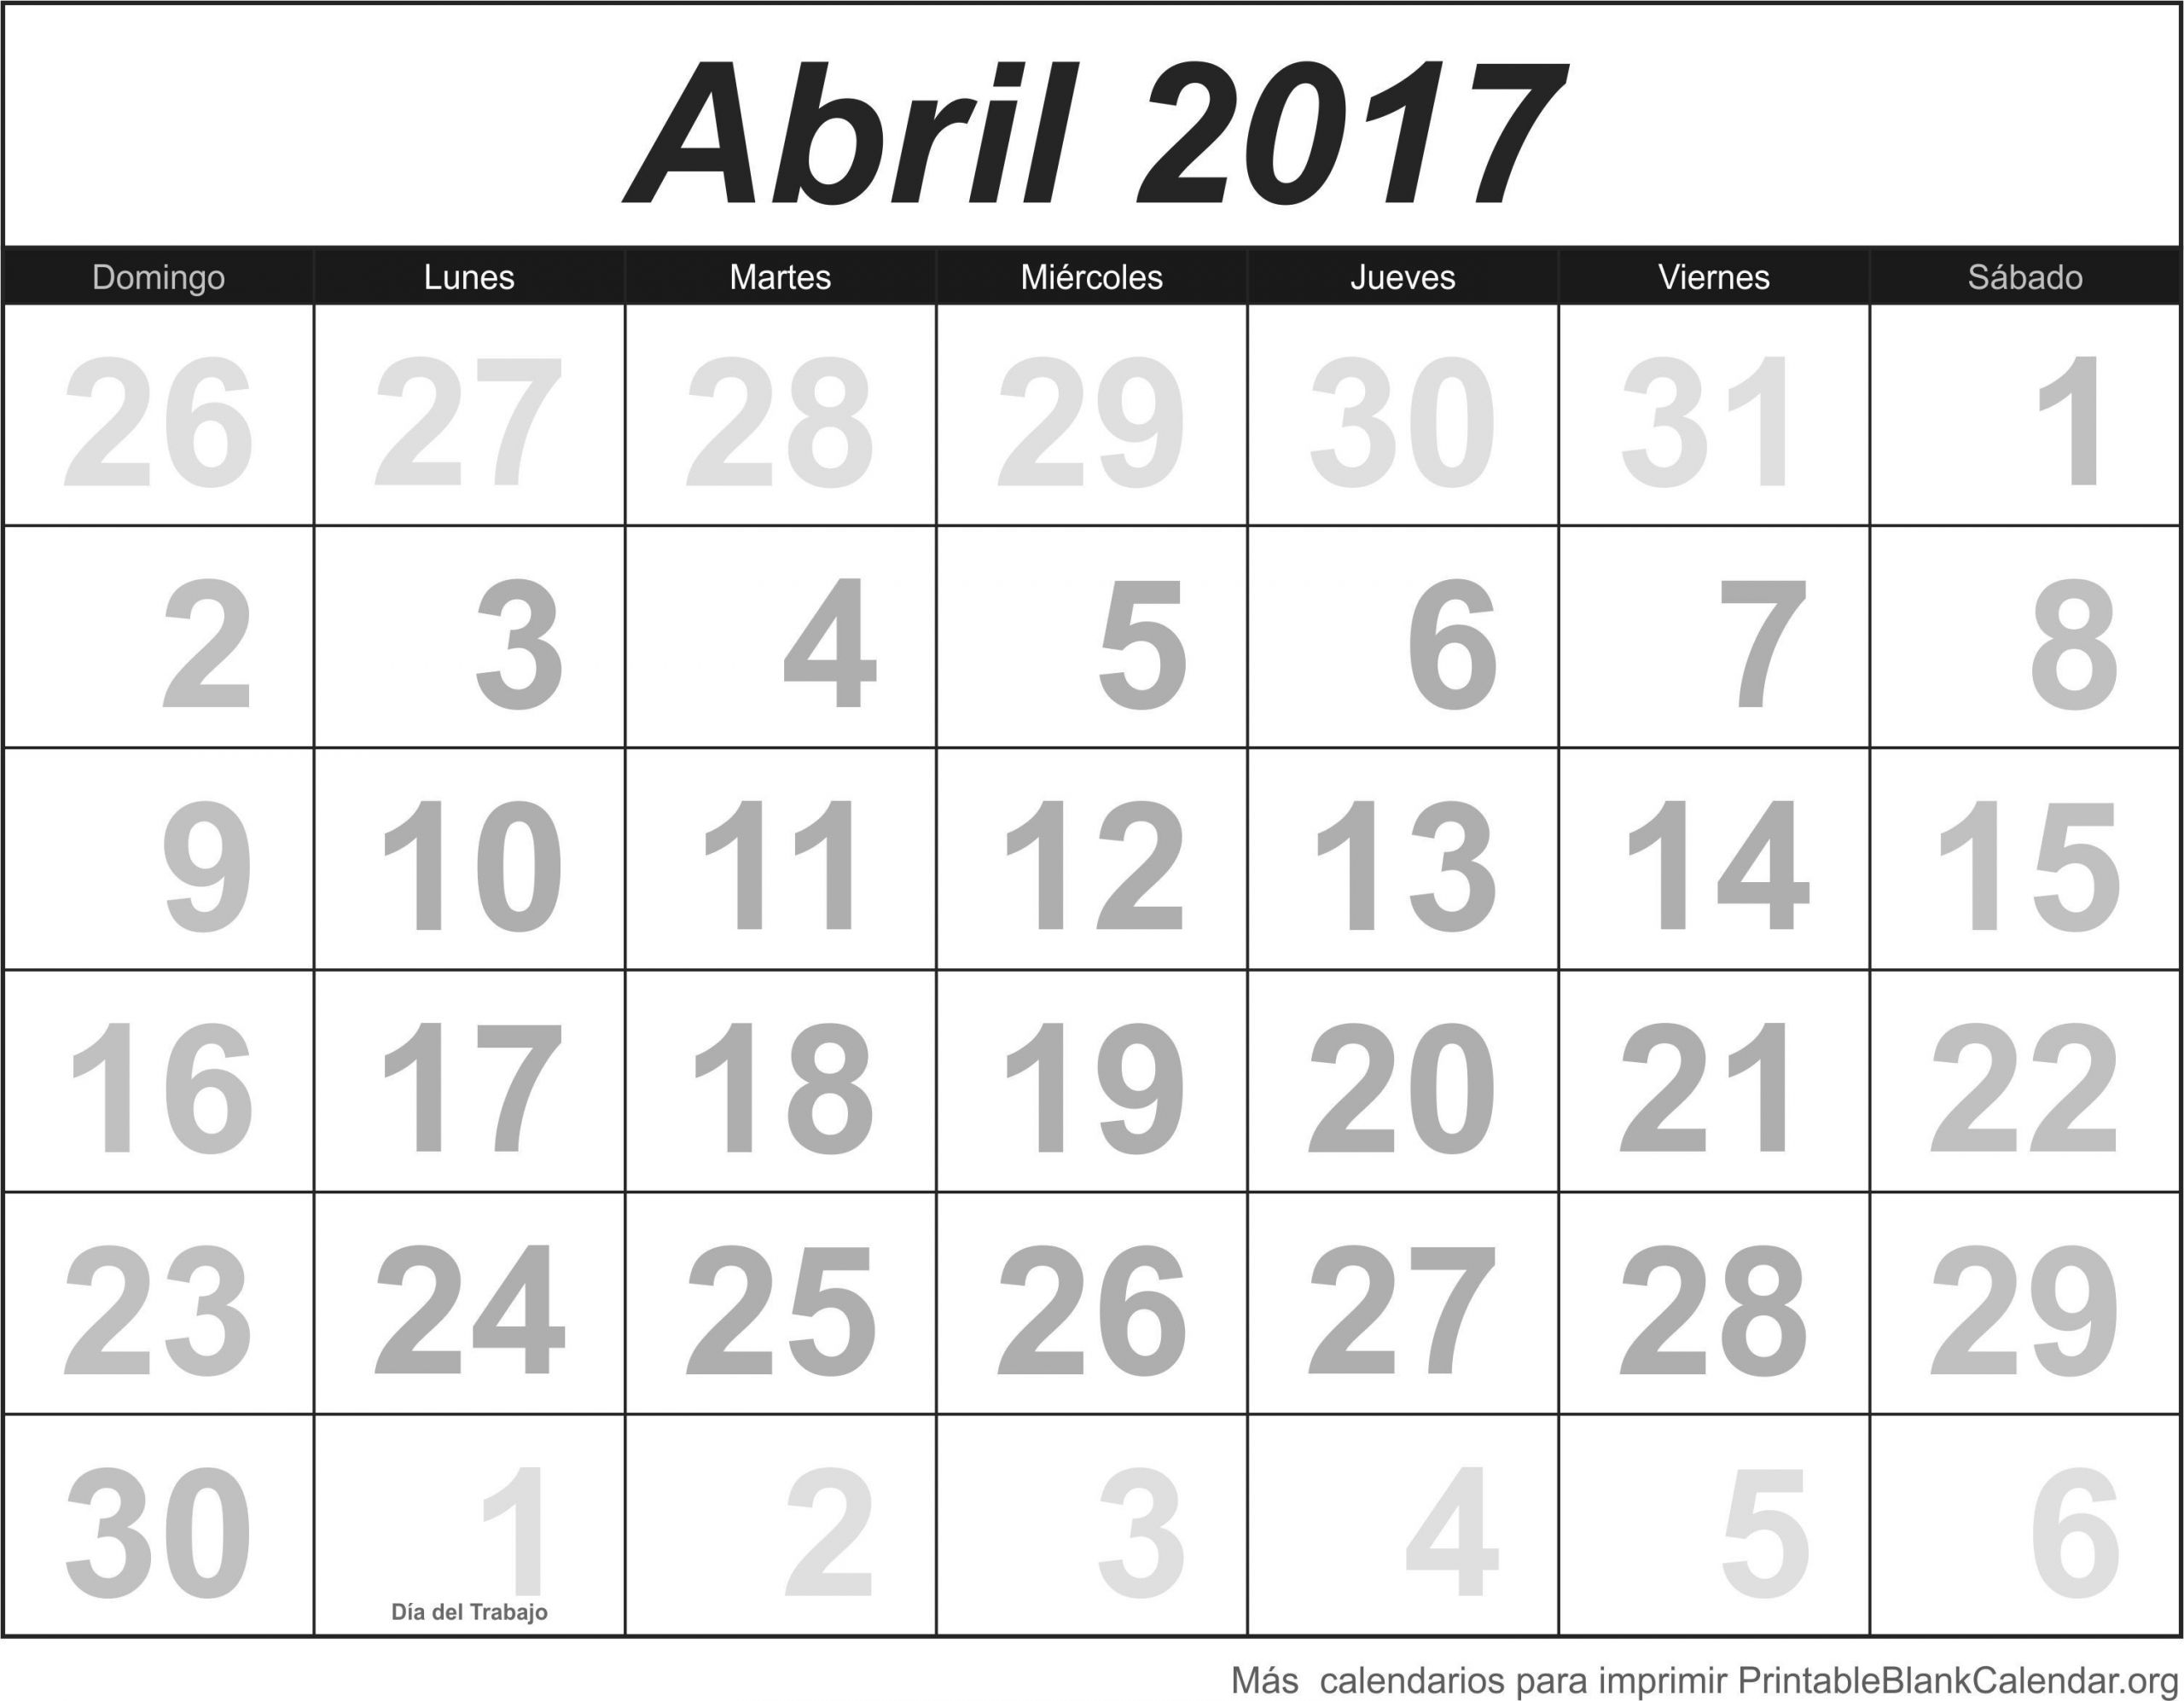 calendario febrero 2018 con dibujos mas actual imagenes de calendarios calendario para imprimir abril of calendario febrero 2018 con dibujos